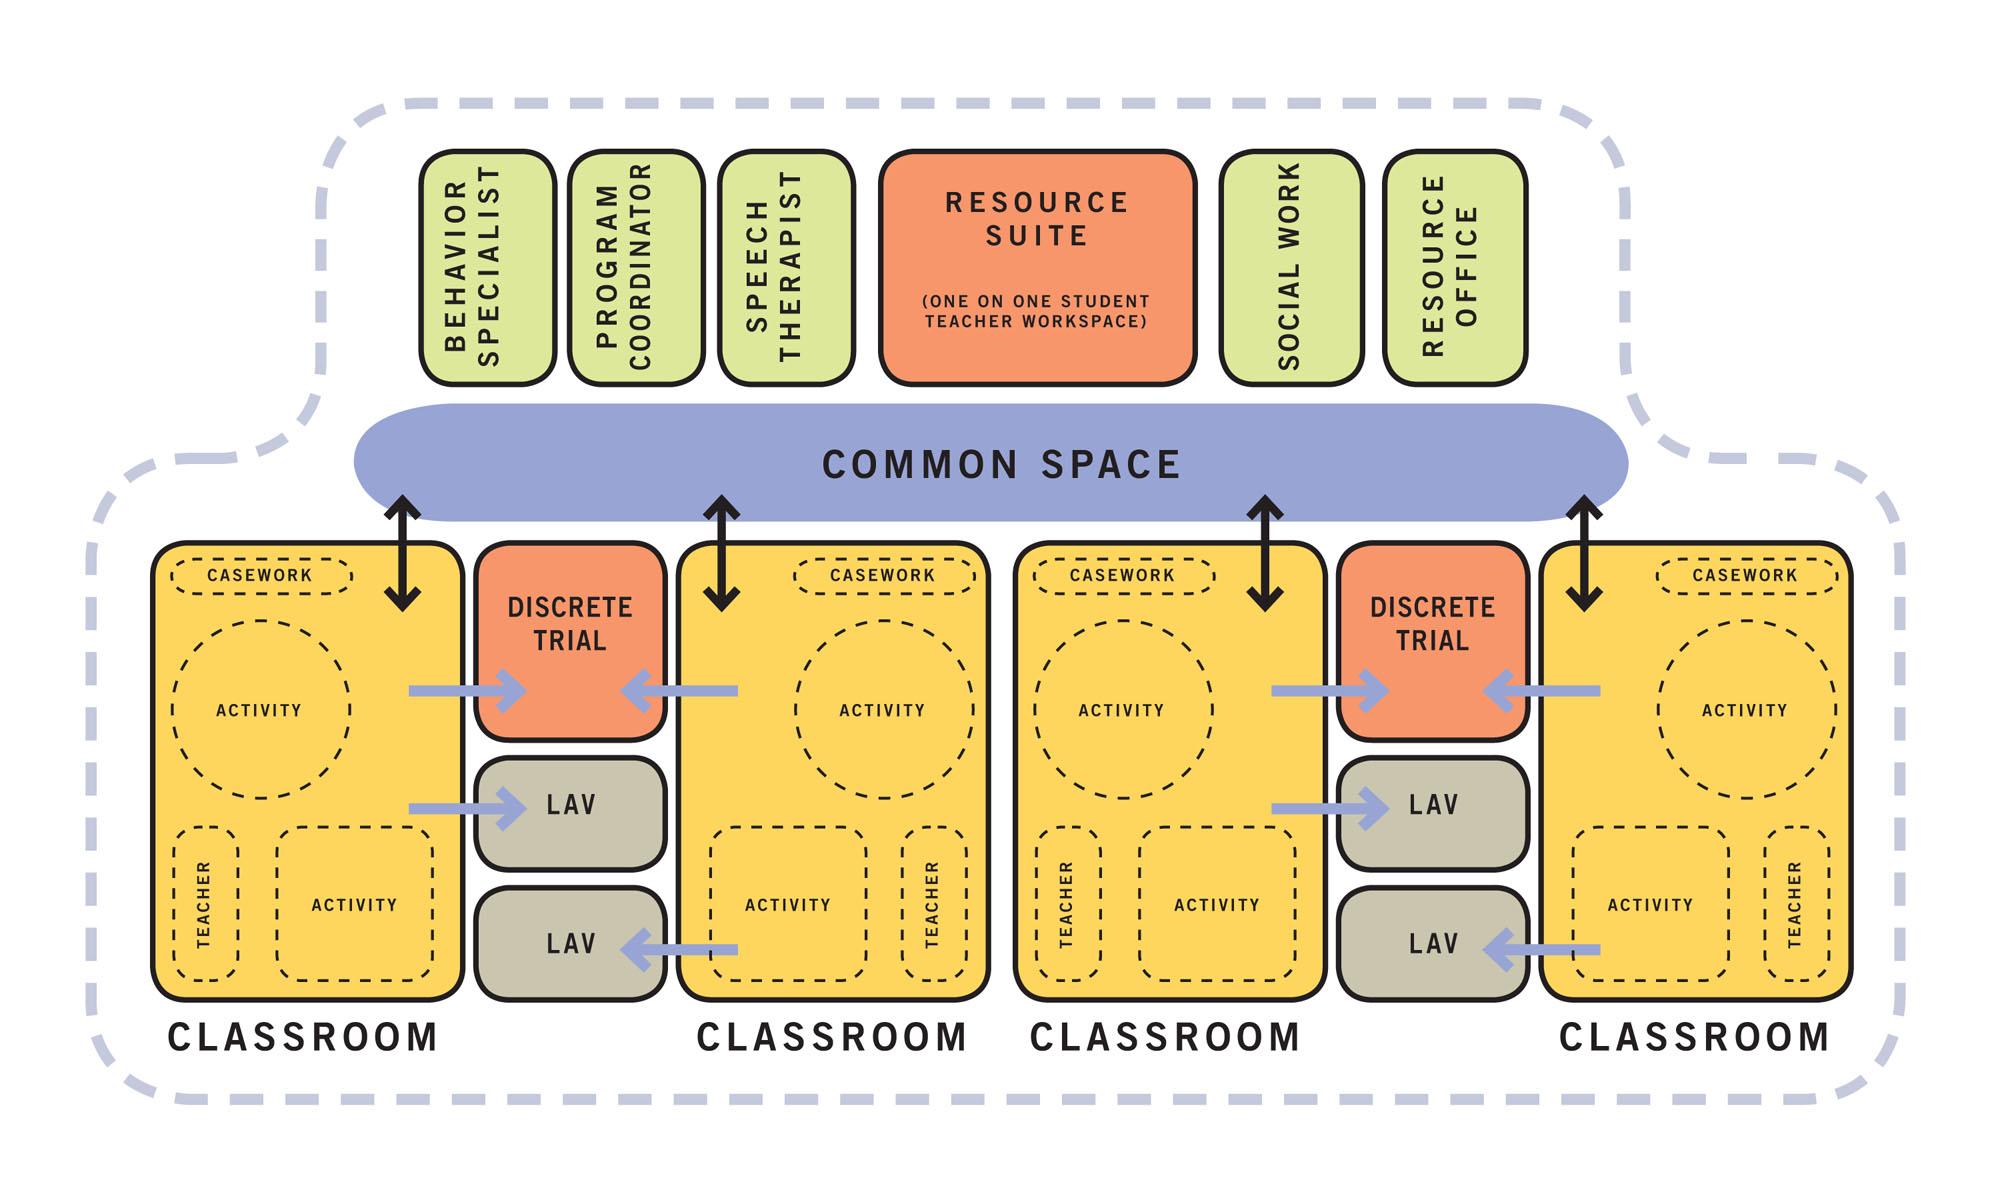 School organization diagram